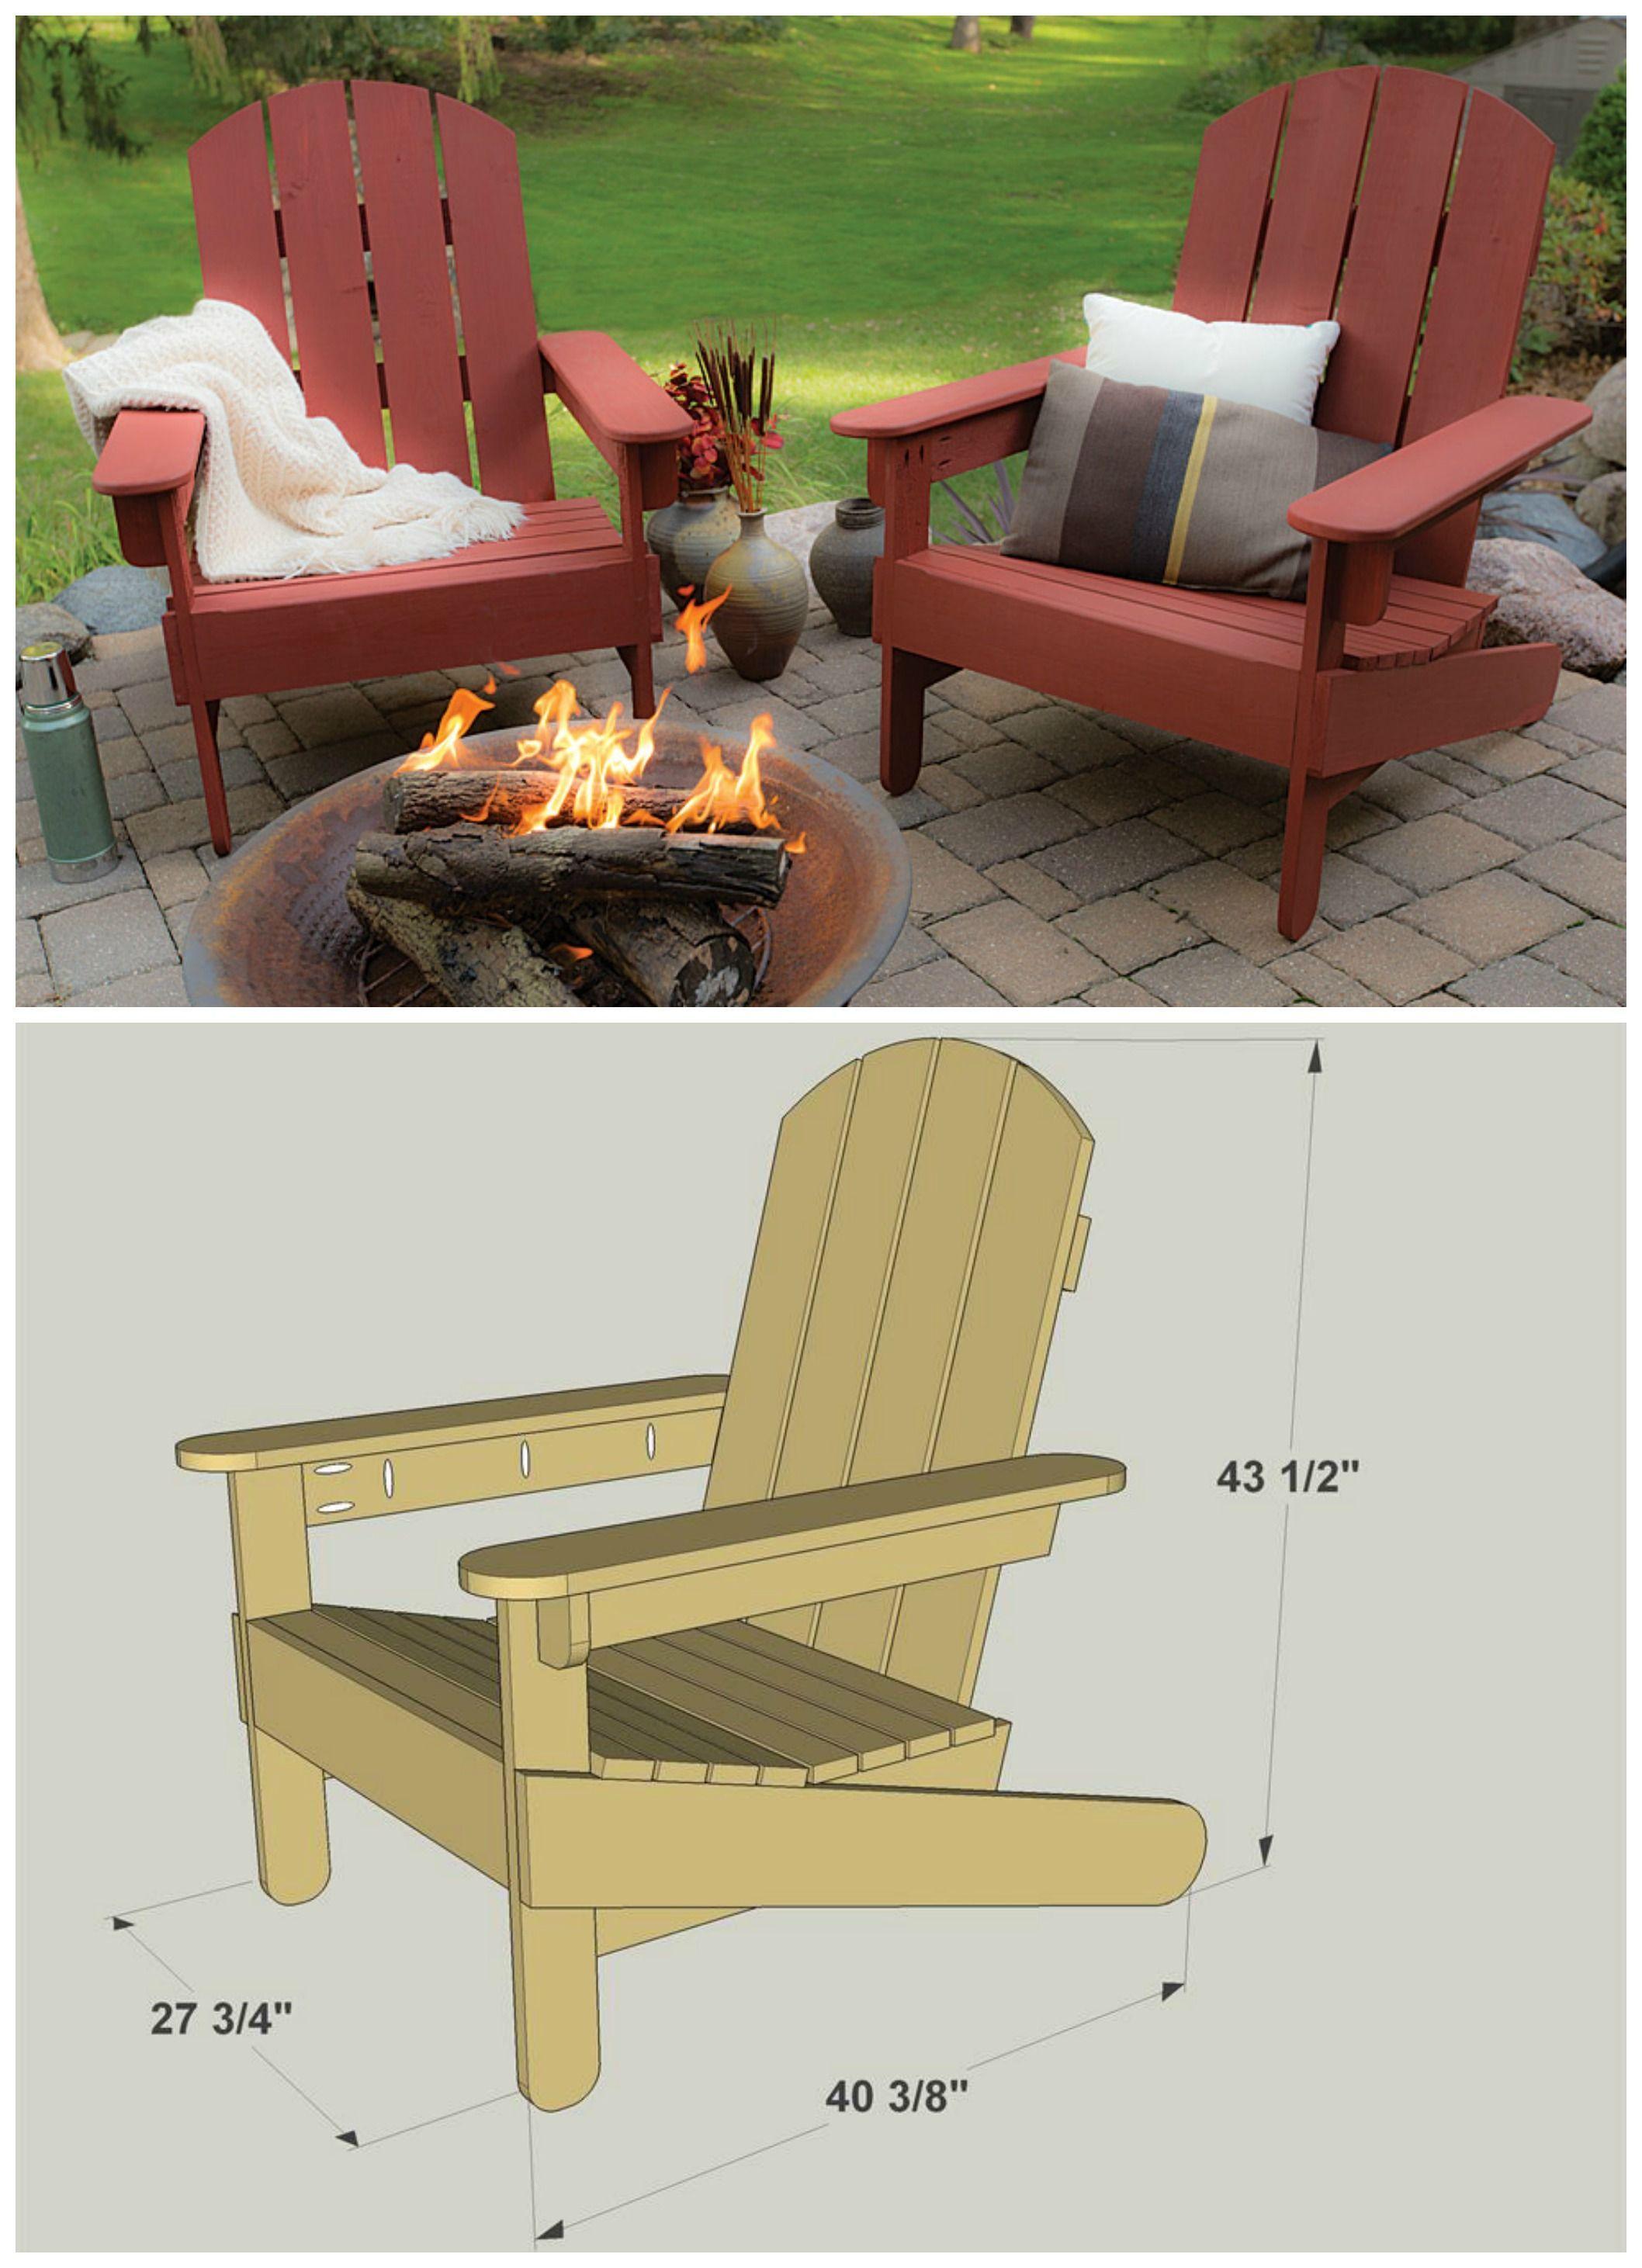 Diy adirondack chairs free plans at